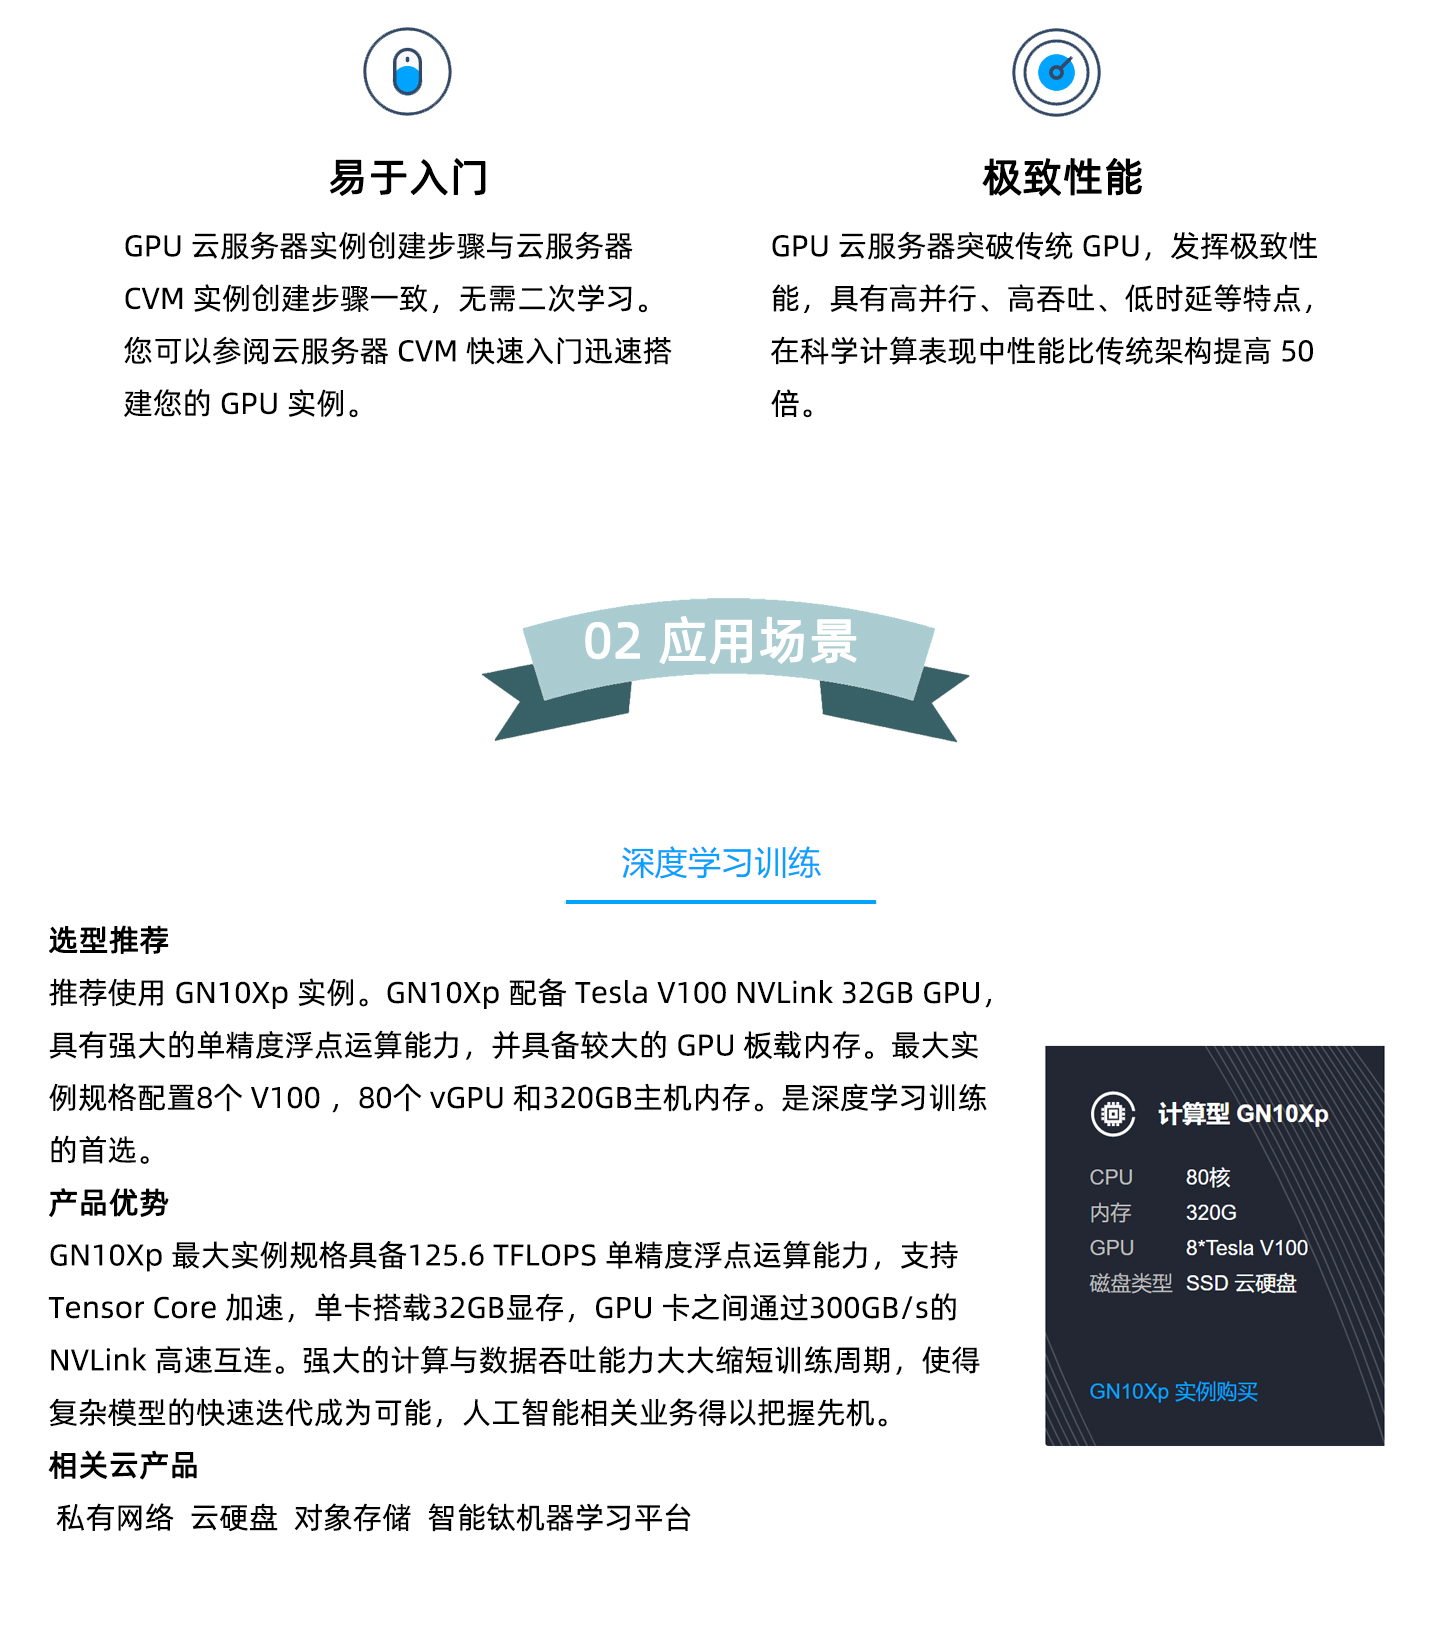 GPU-云服务器-1440_02.jpg